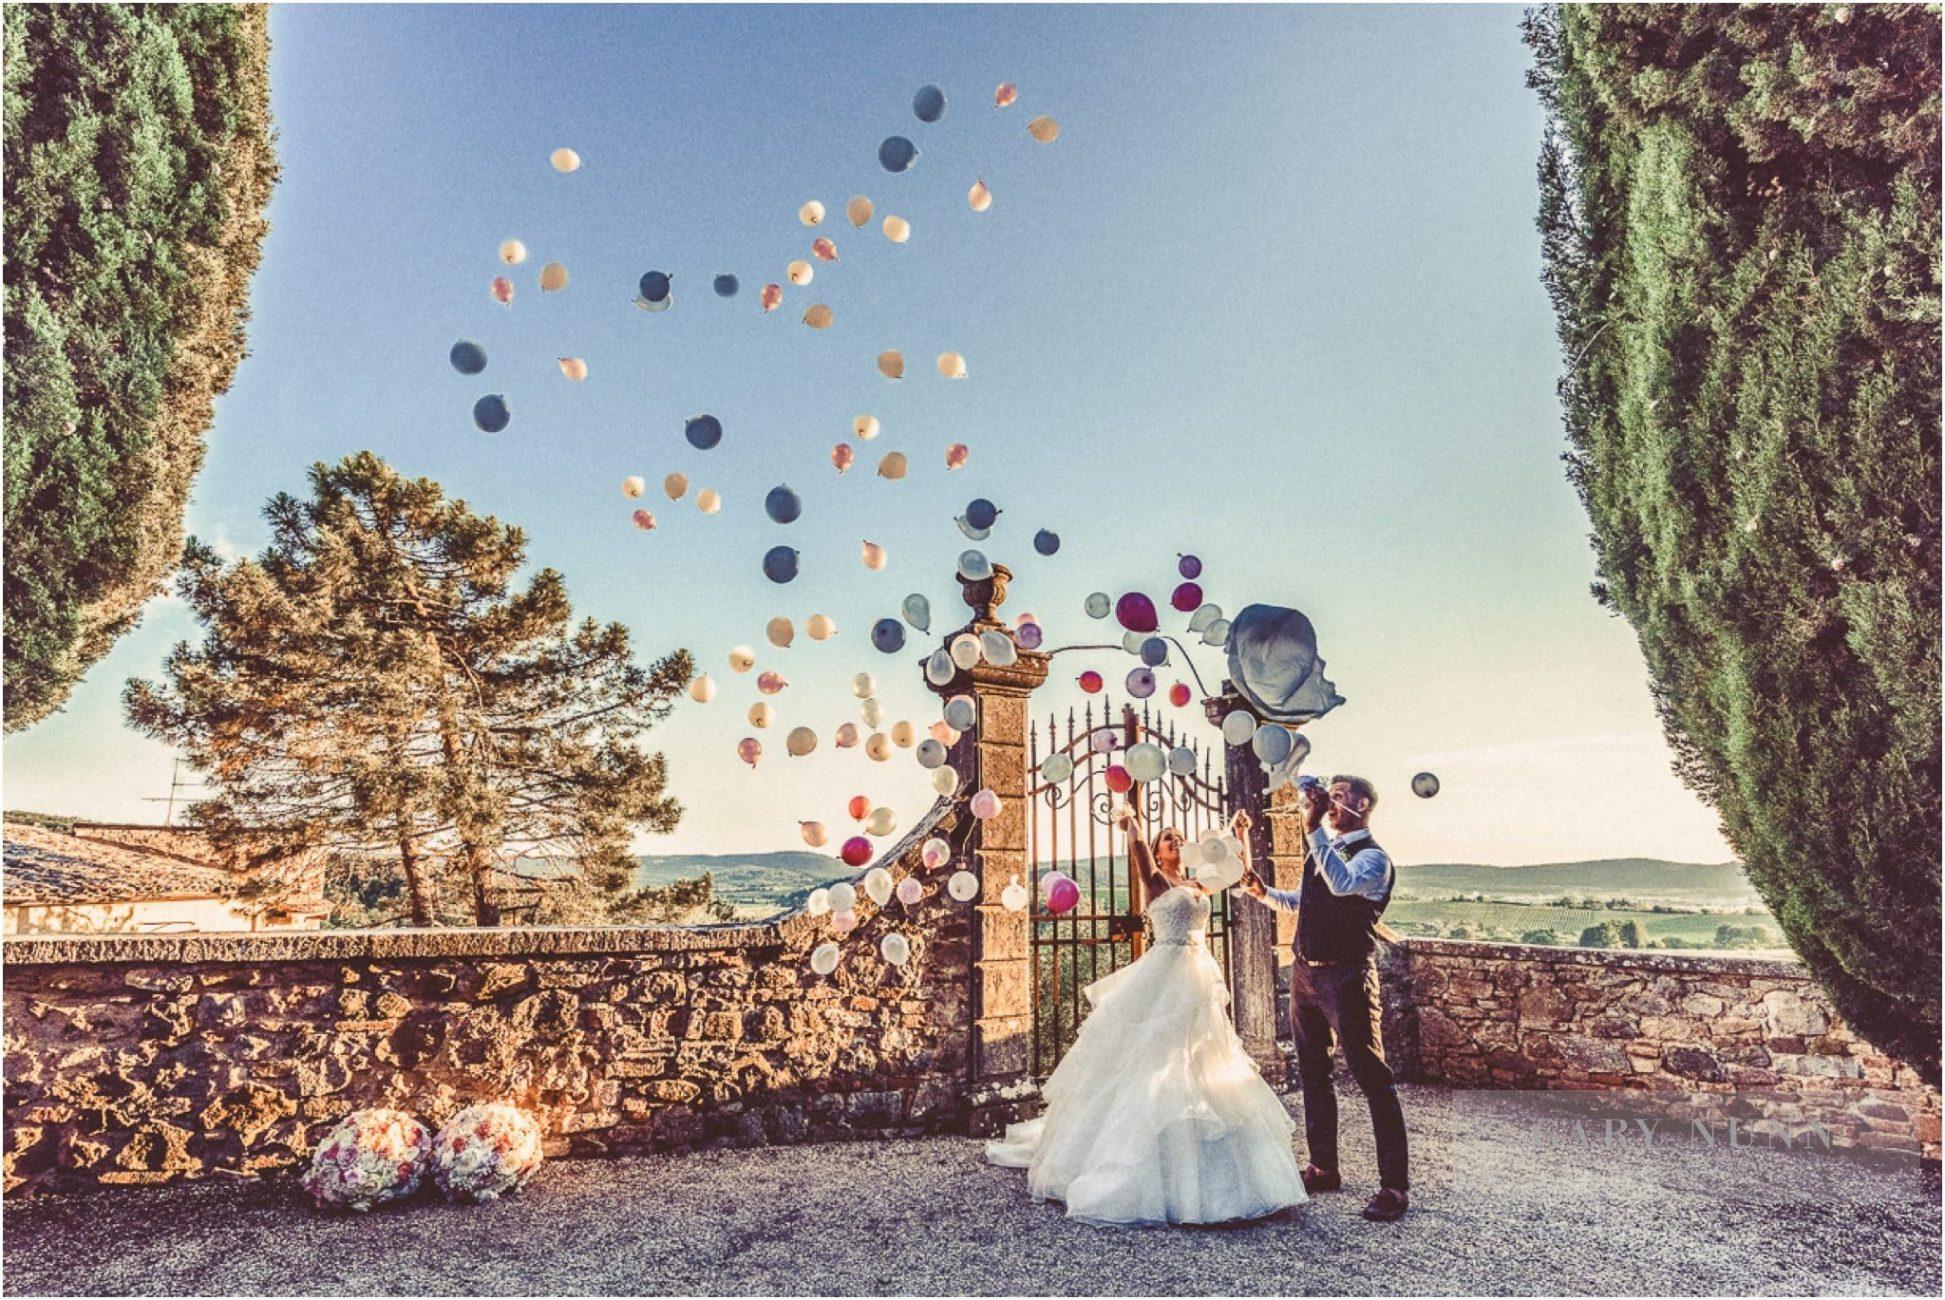 wedding photographer pricing